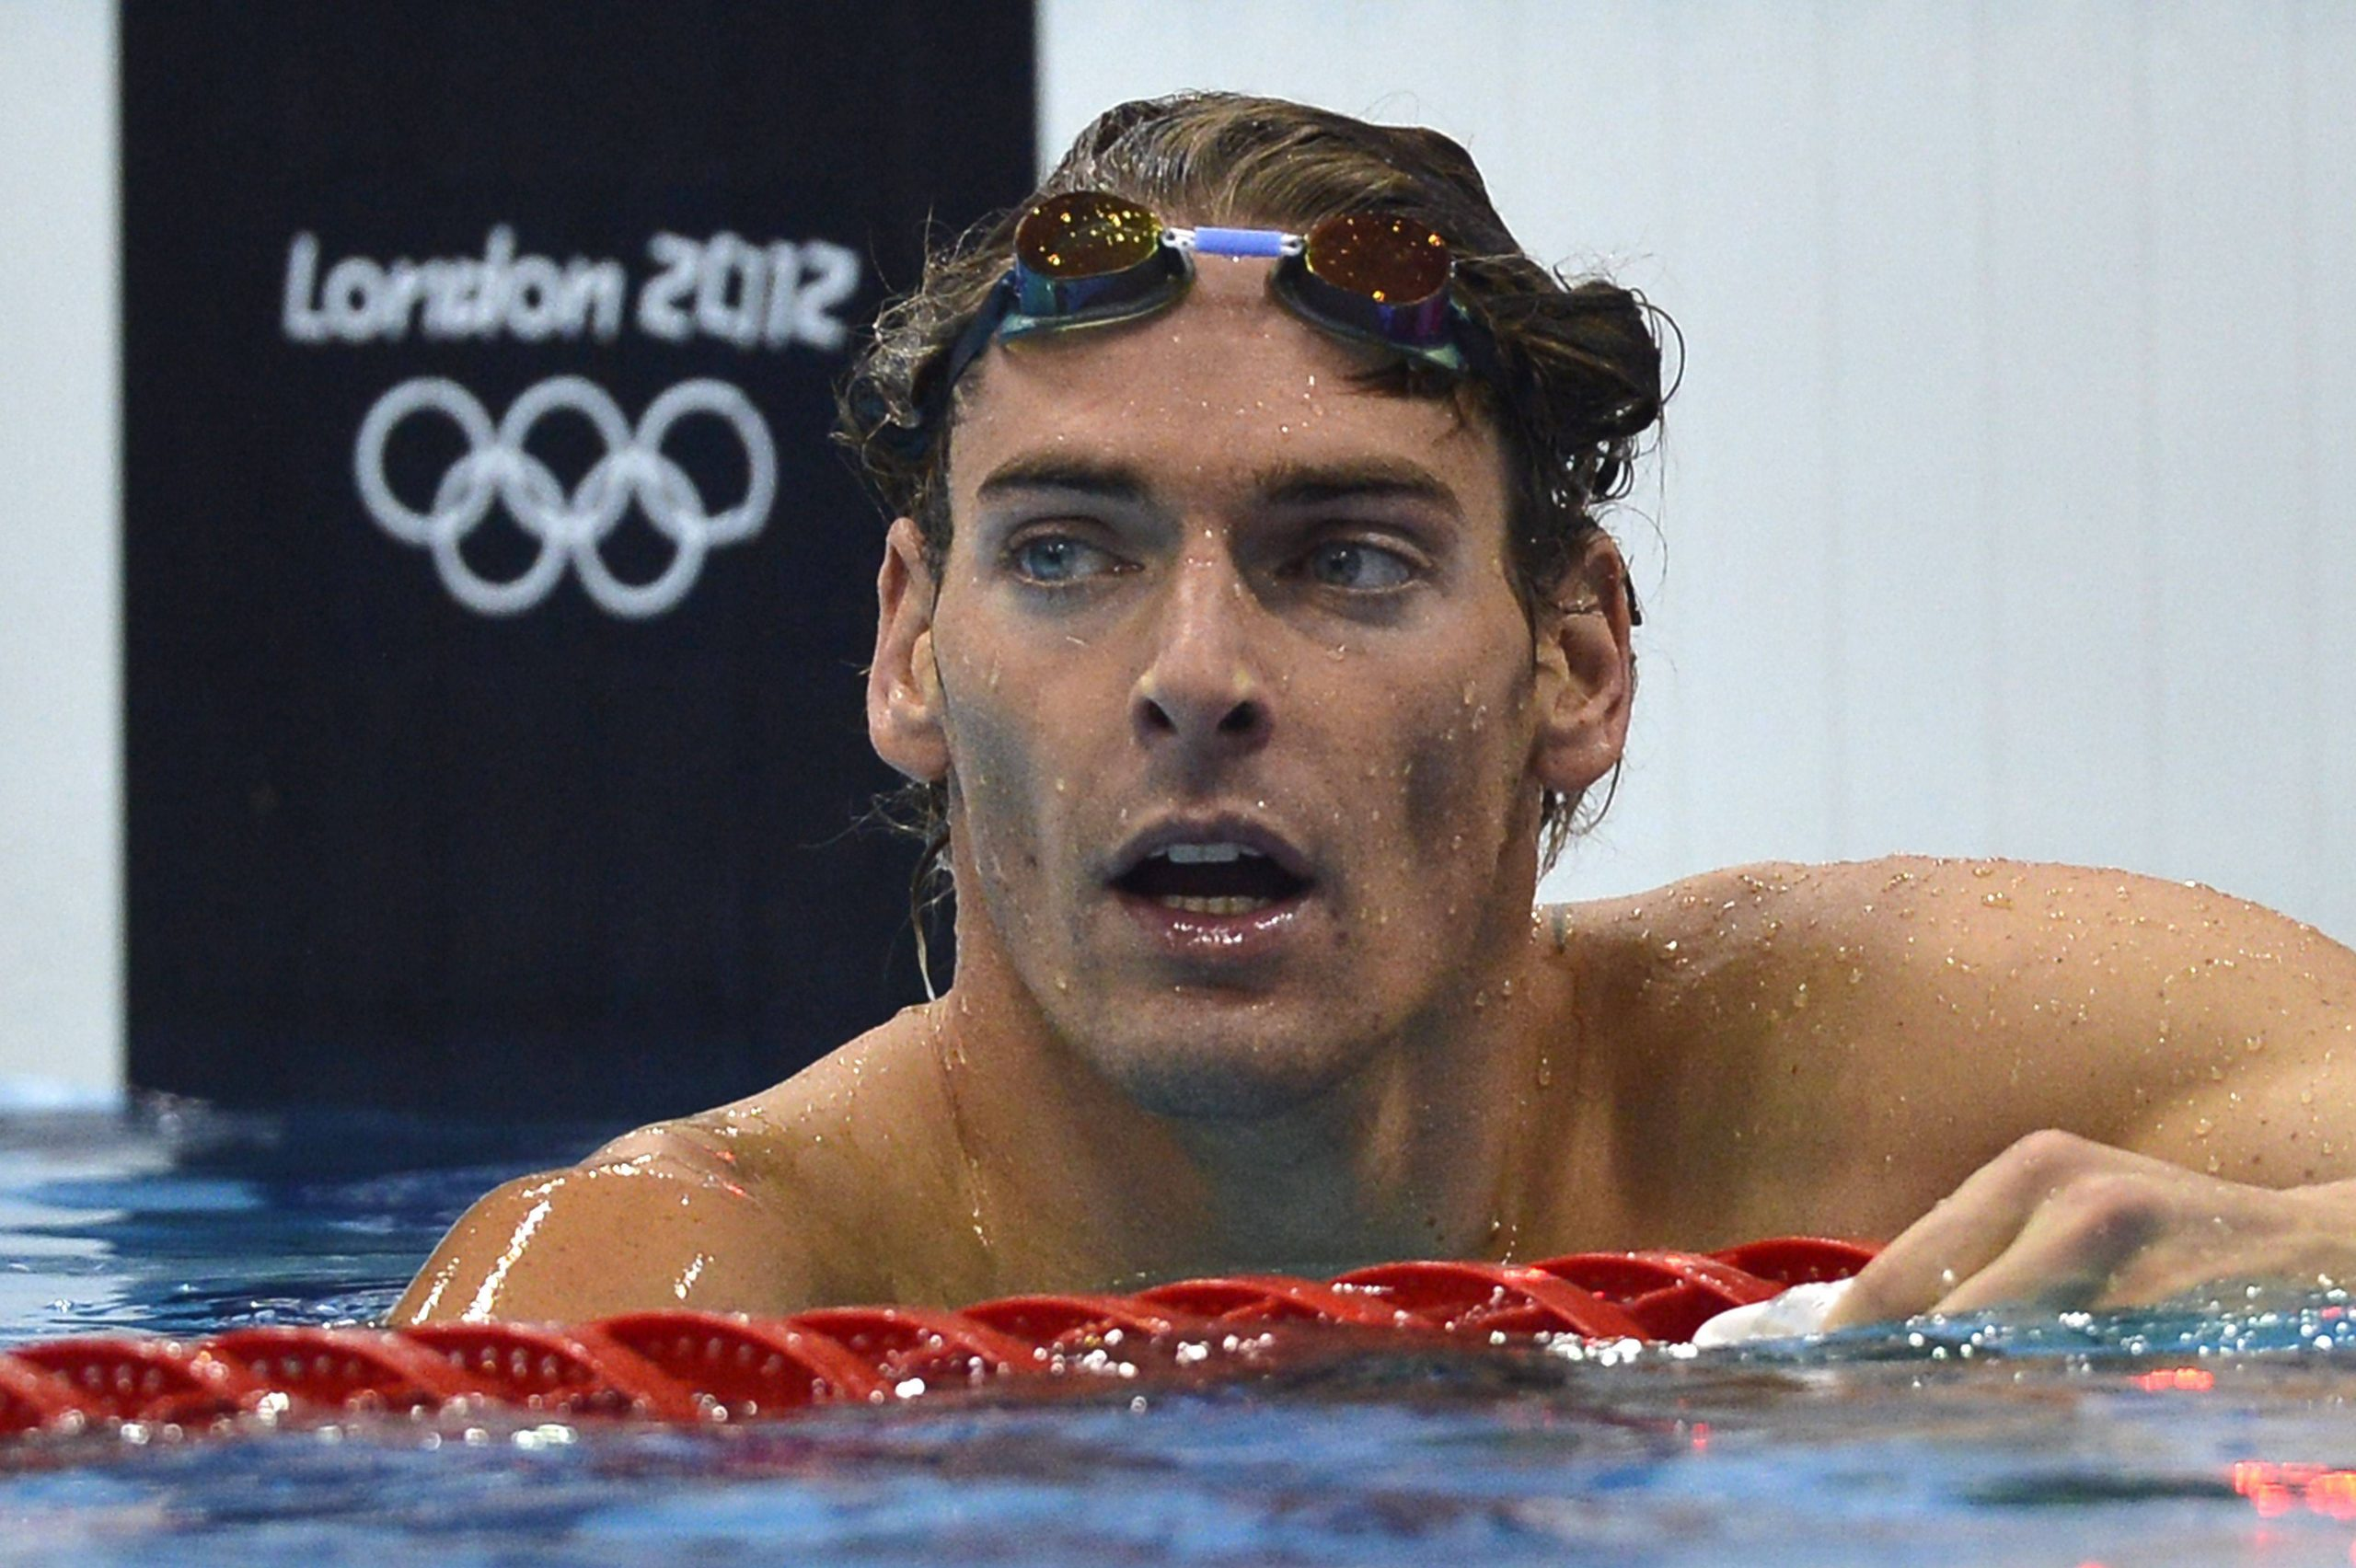 champion olympique natation